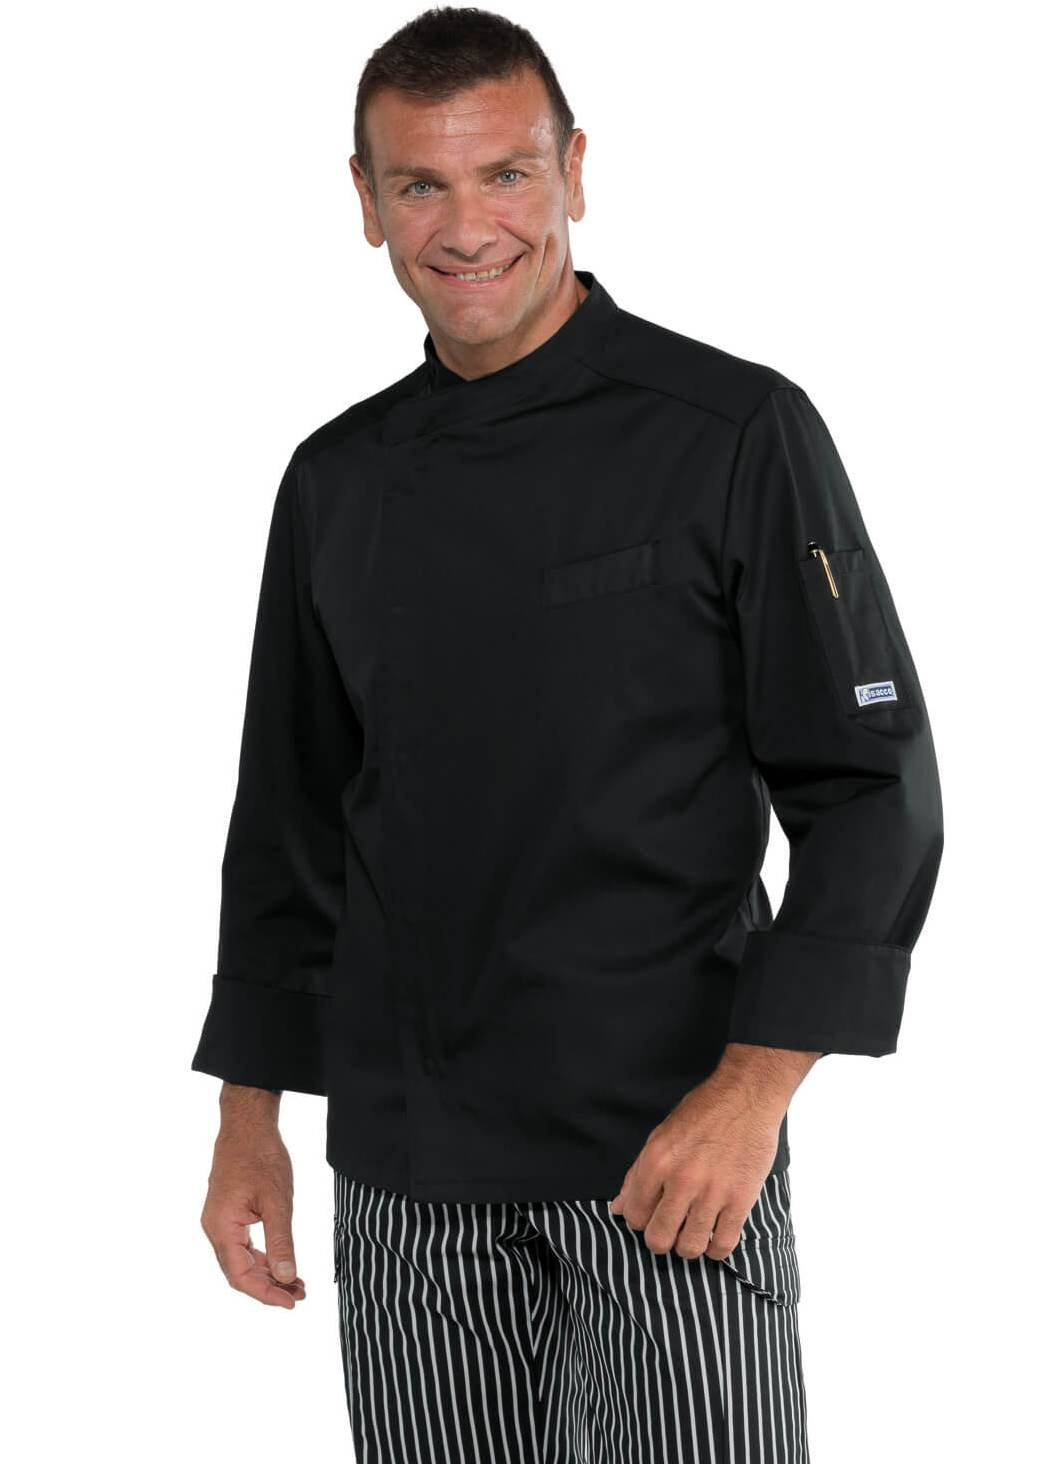 Veste cuisinier bilbao noir polycoton for Cuisinier 68